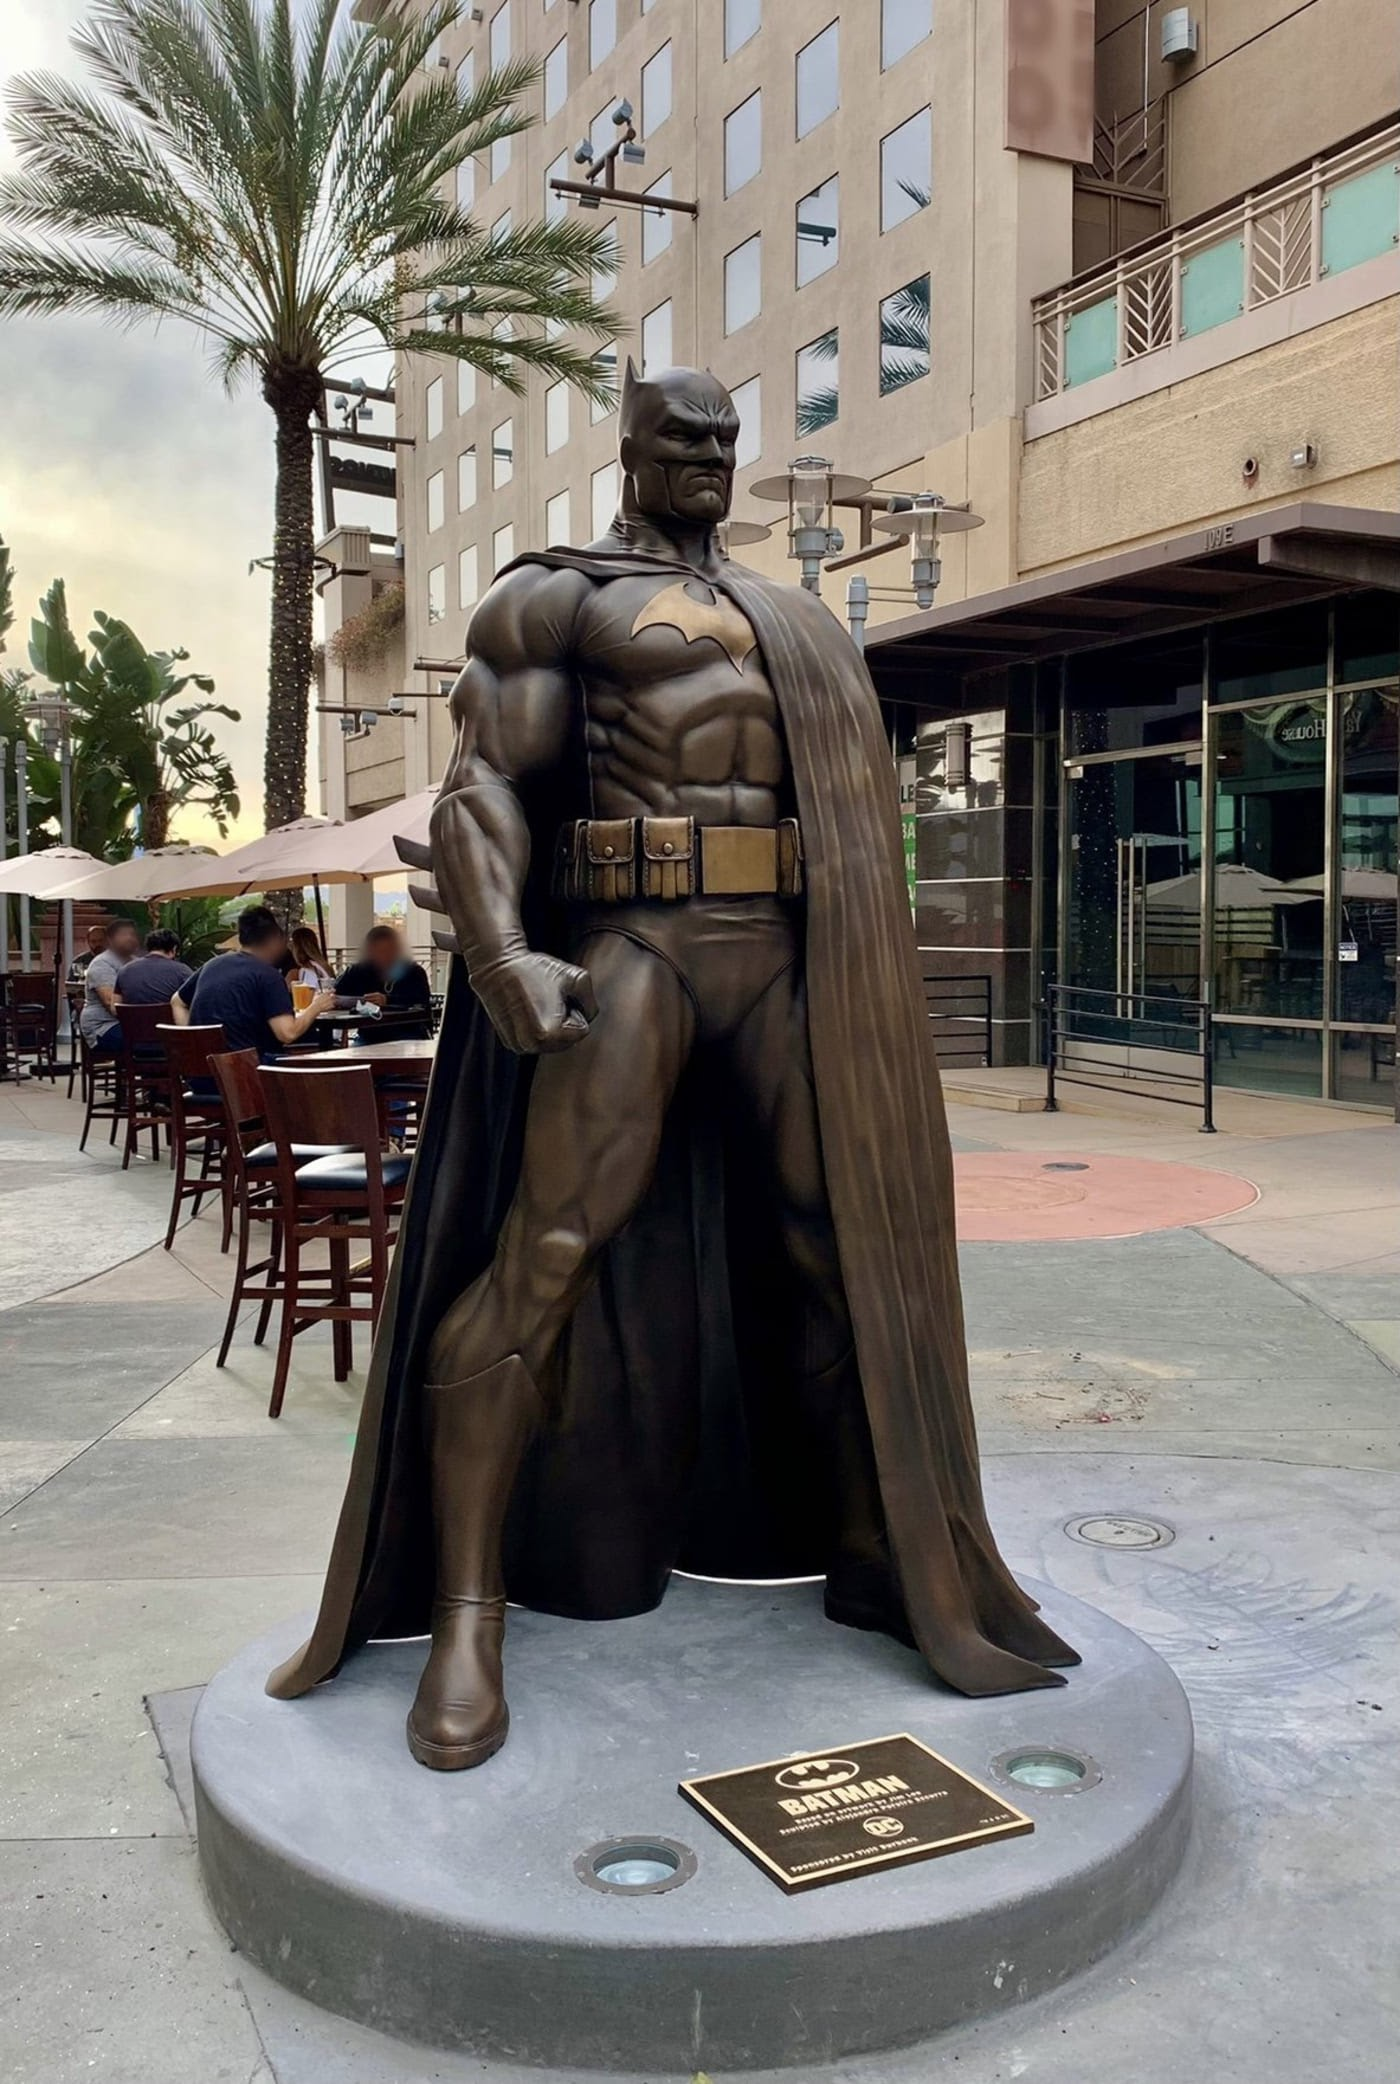 Batman statue in Burbank, California : カリフォルニアの陽射しを浴びて、健康的に立ち尽くすバットマンのブロンズ像がバーバンクに登場 ! !